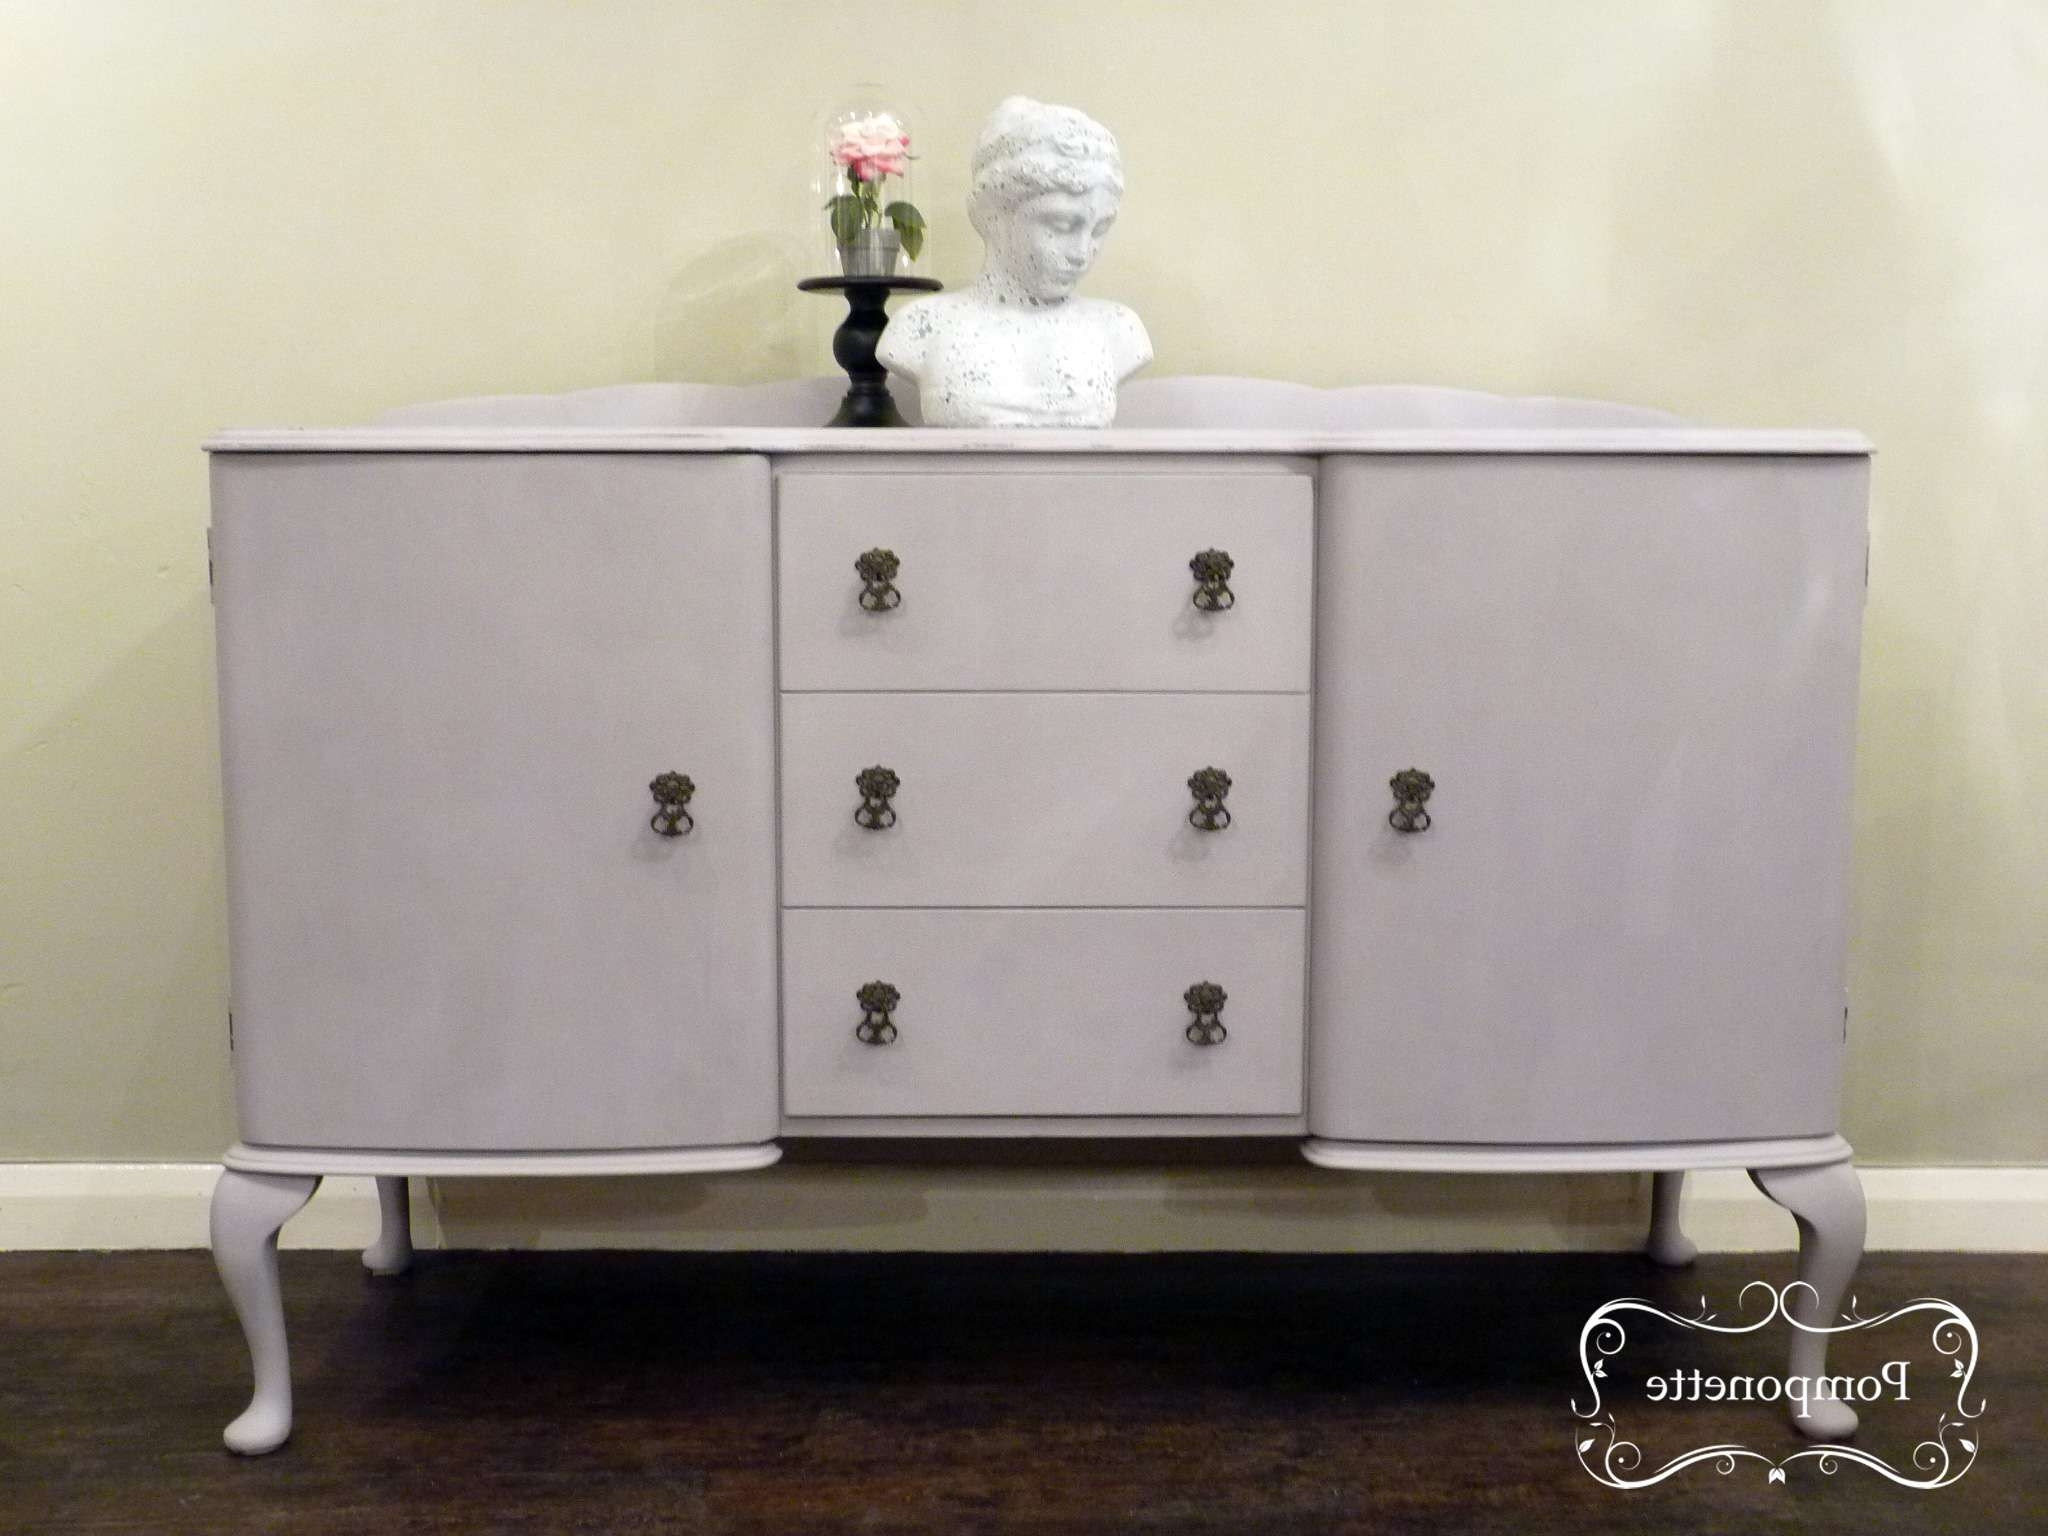 Sideboardpomponette|vintage Painted Furniture Regarding Chalk Painted Sideboards (View 17 of 20)